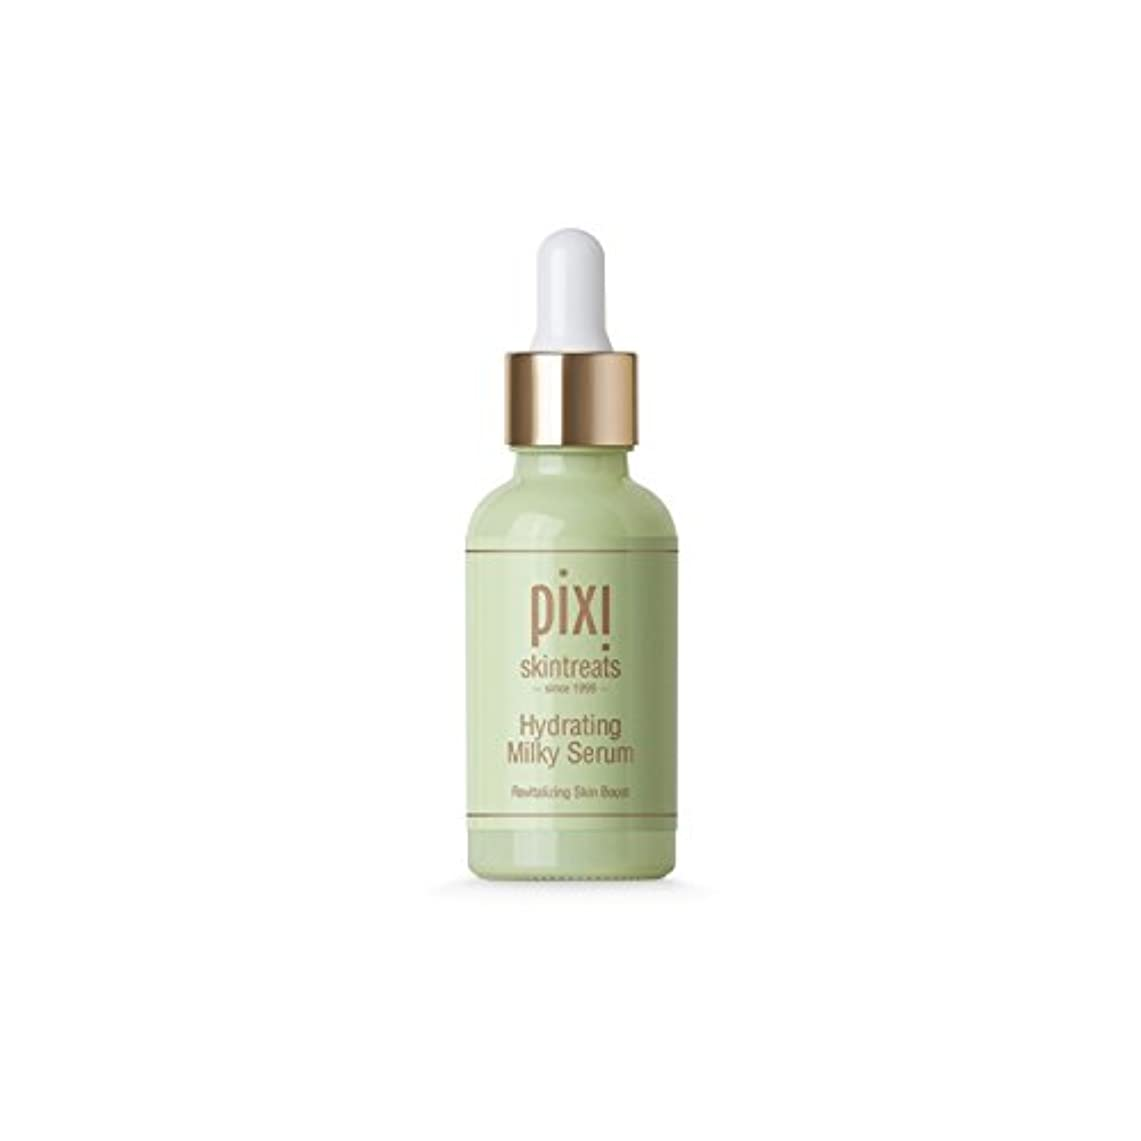 Pixi Hydrating Milky Serum (Pack of 6) - 乳白色の血清を水和 x6 [並行輸入品]